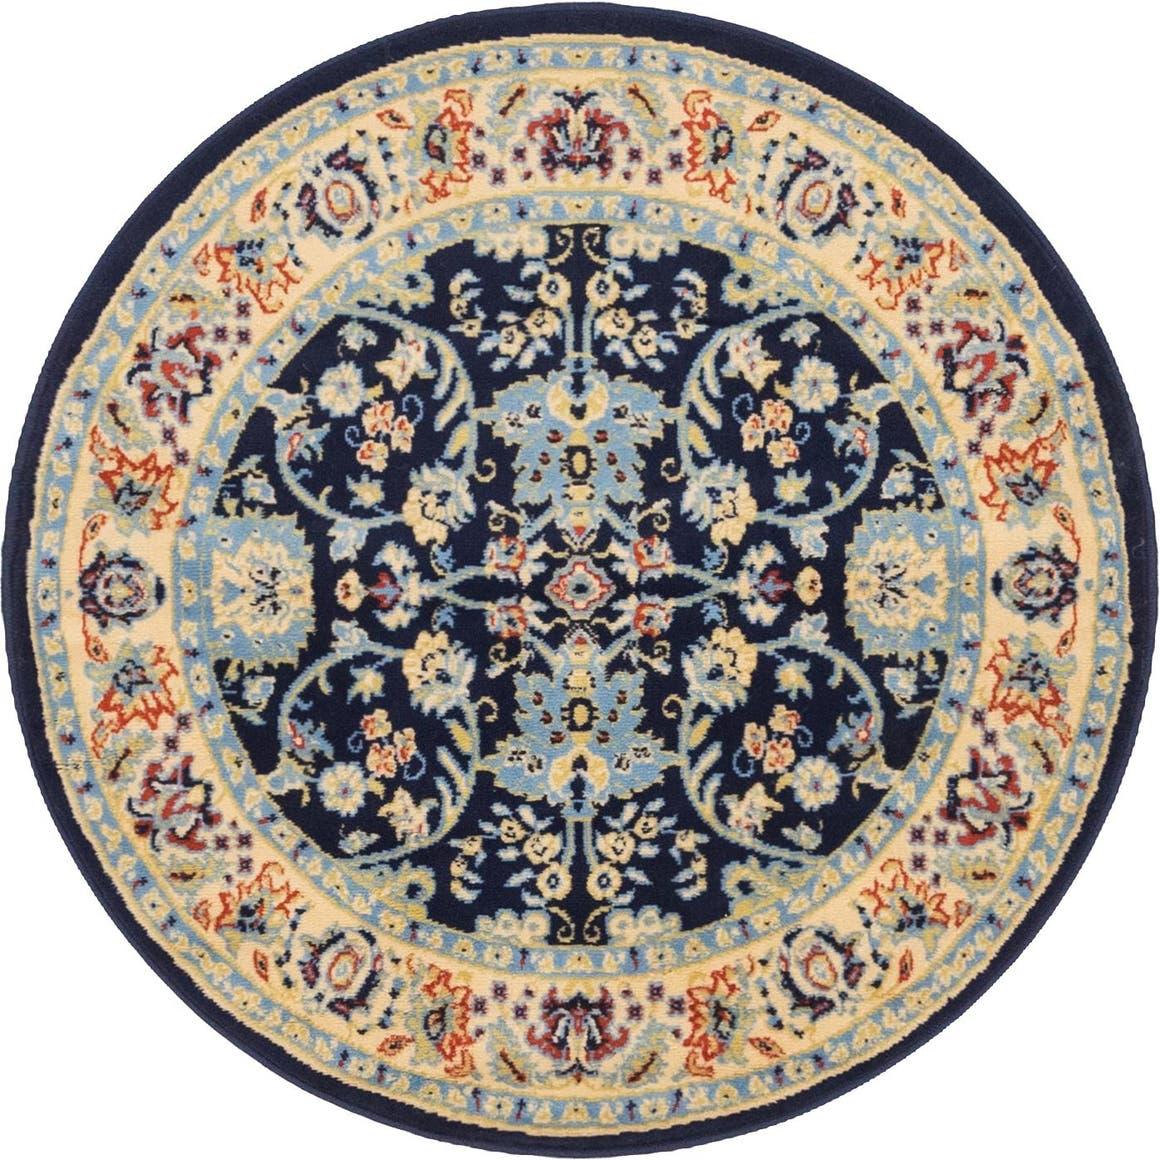 4' x 4' Kashan Design Round Rug main image